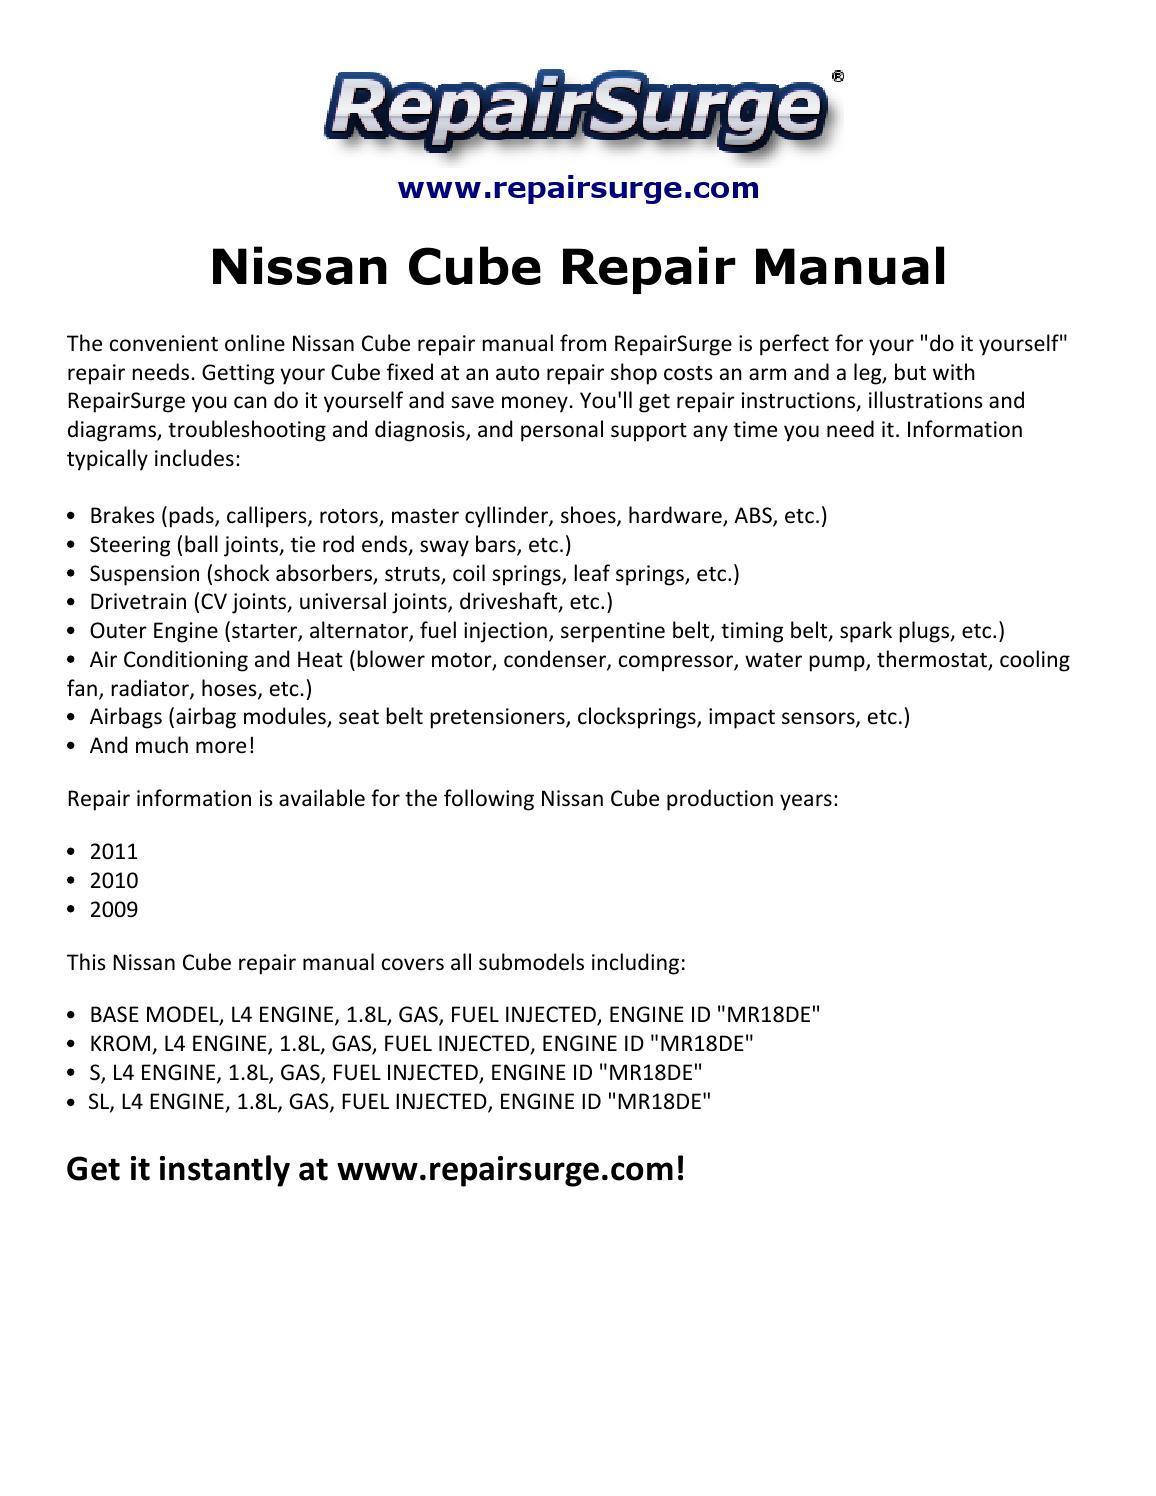 2010 nissan cube engine diagram wiring diagram expertsnissan cube engine diagram wiring diagram gp 2010 nissan cube engine diagram